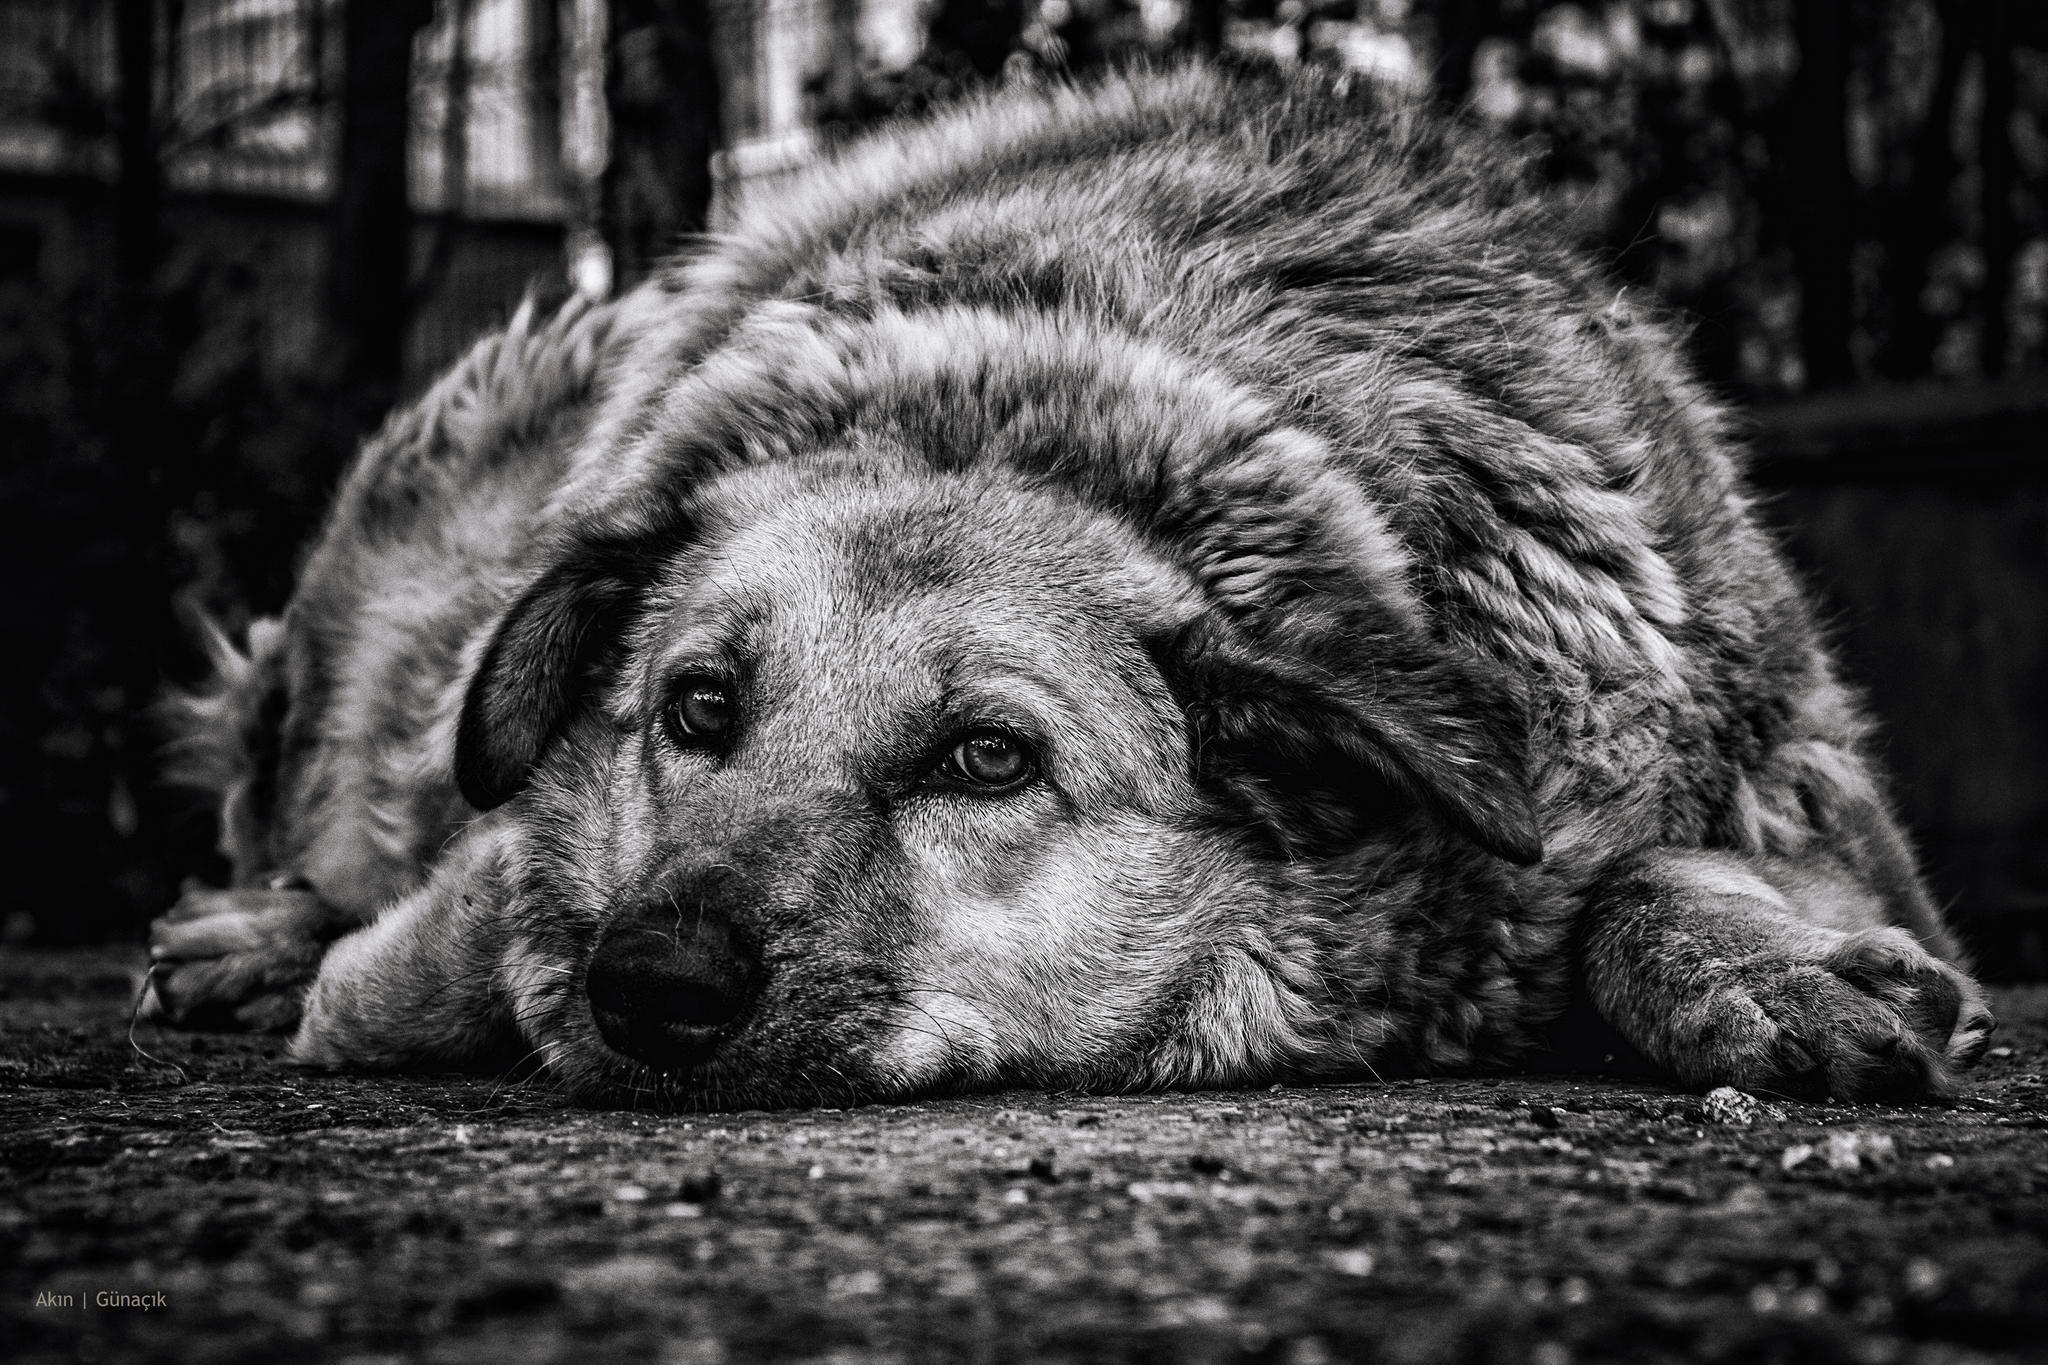 Stray Dog Black And White Dog Photography DogsinBlackAndWhite - This photographer is celebrating stray cats through majestic portrait photographs